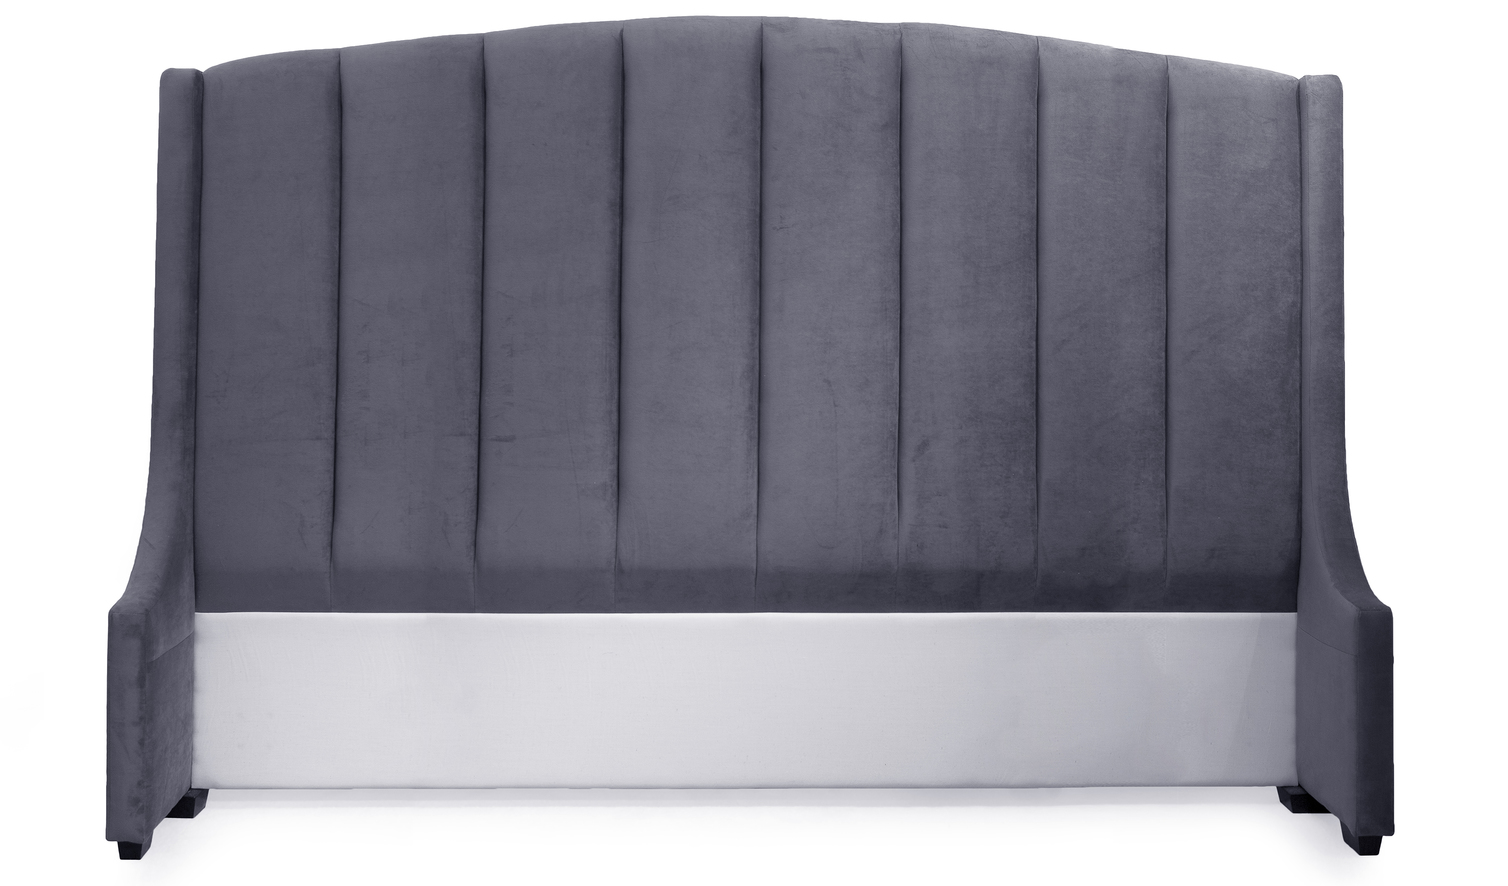 Fabric Headboard & Base 195 - King